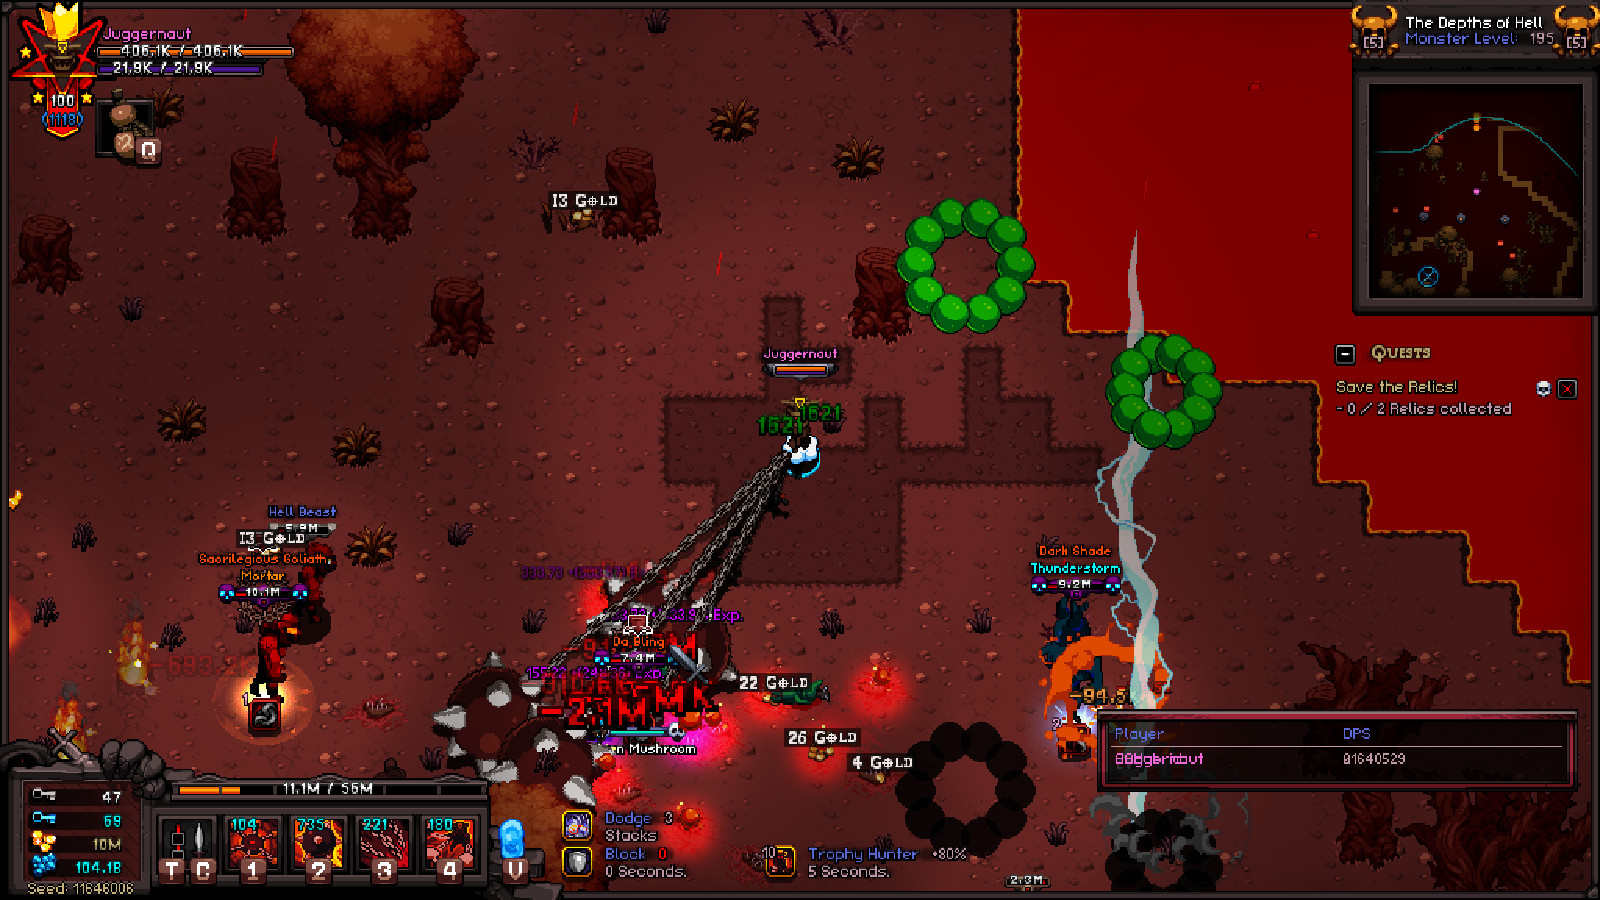 hero-siege-pc-screenshot-4